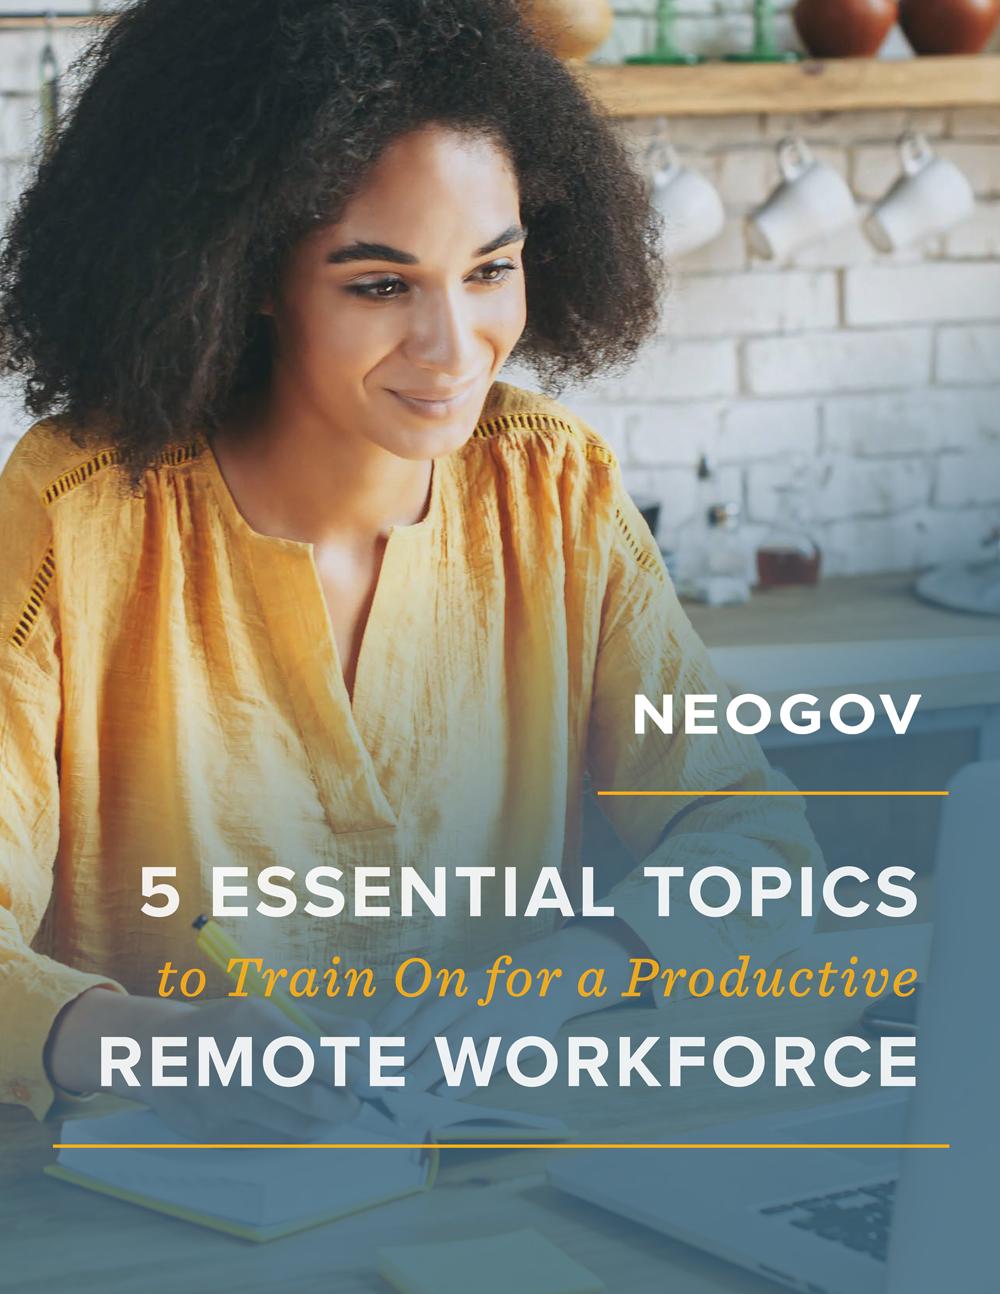 NEOGOV 5 Training Topics Remote Workforce